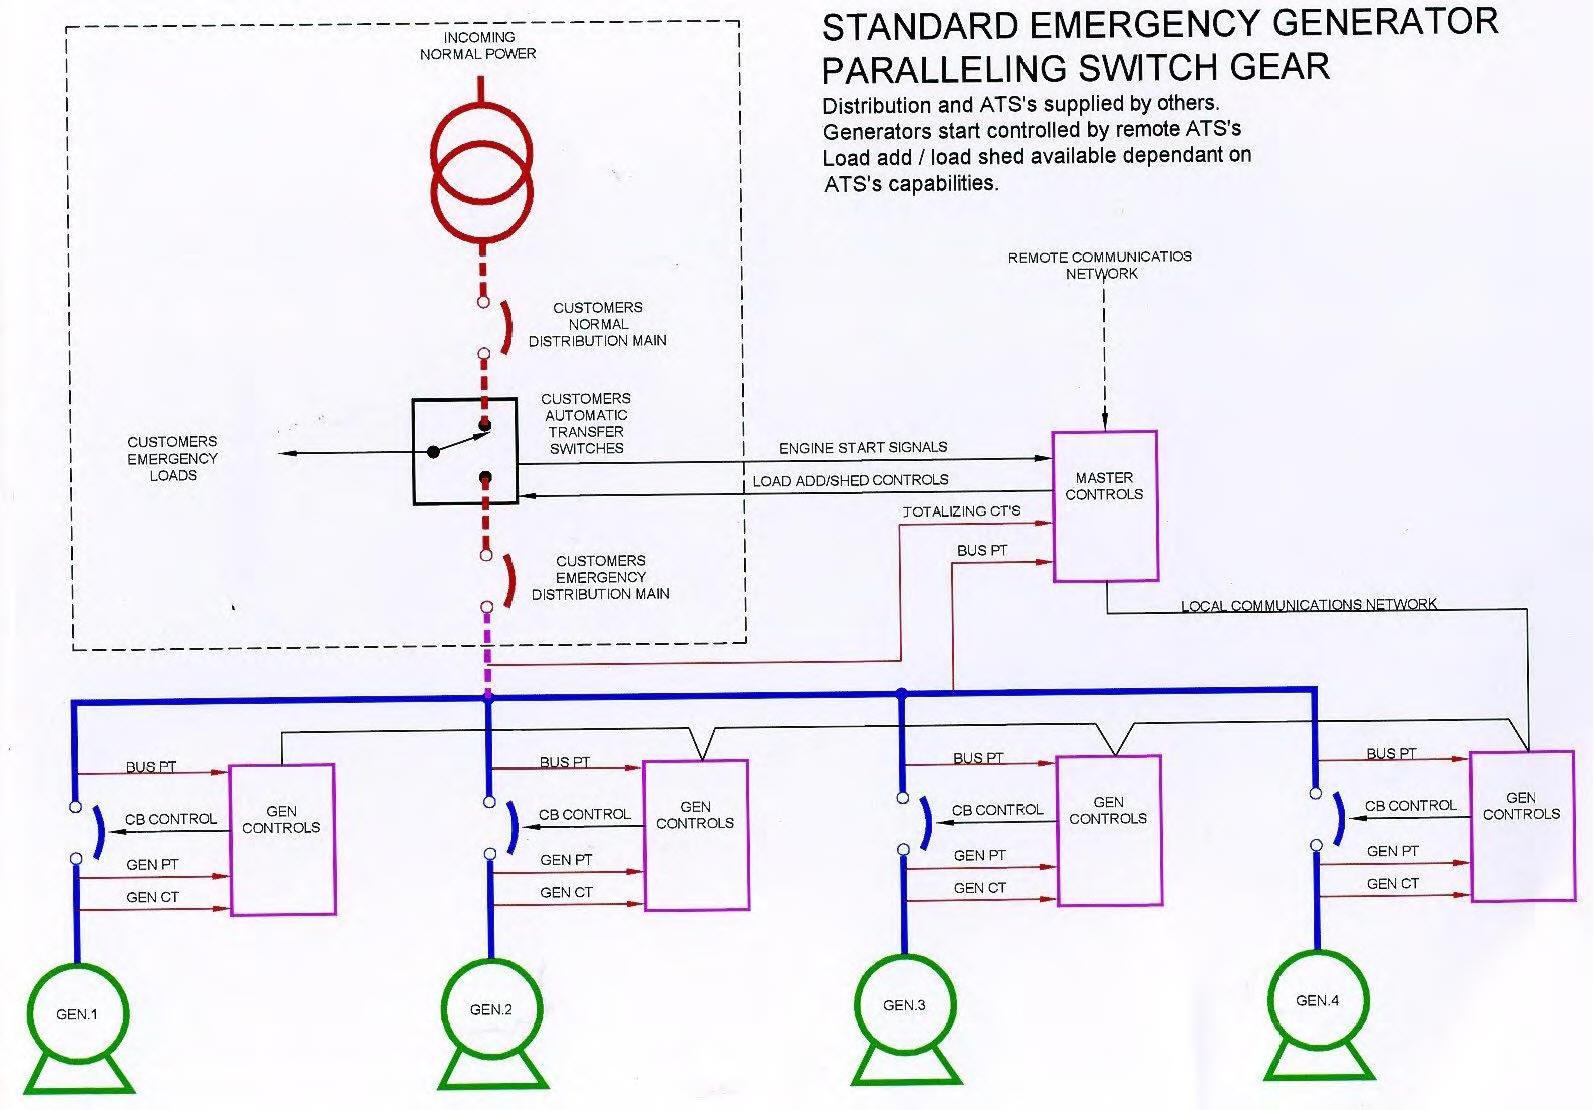 Marathon Generators Wiring Diagram Schematics Diagrams Parallel And Generac Generator Control Panel